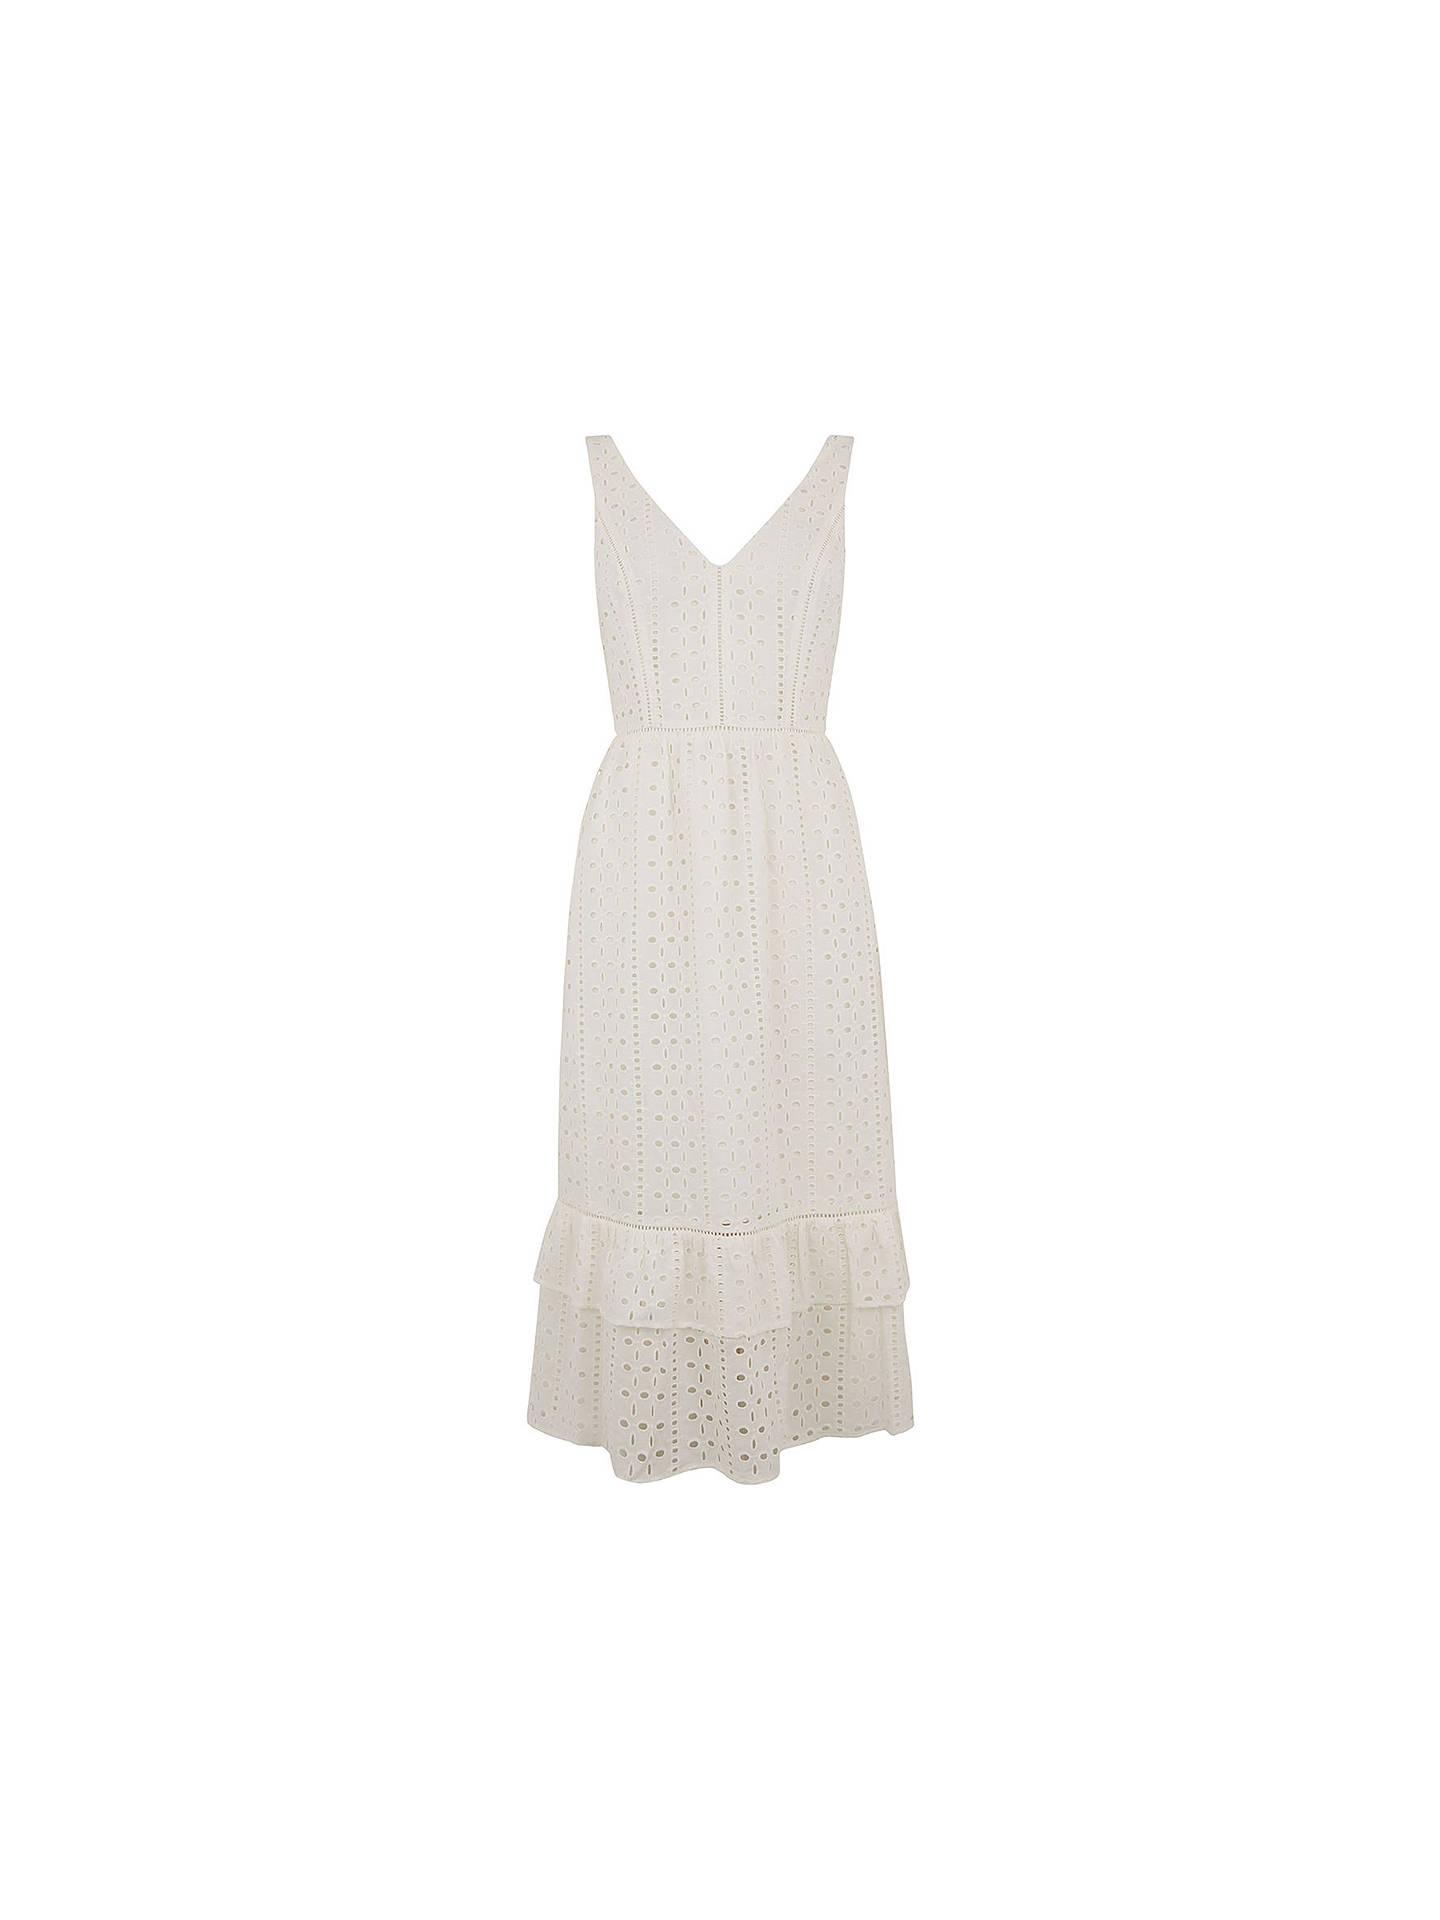 3b020efc19cf ... Buy Oasis Broderie Midi Dress, White, 10 Online at johnlewis.com ...